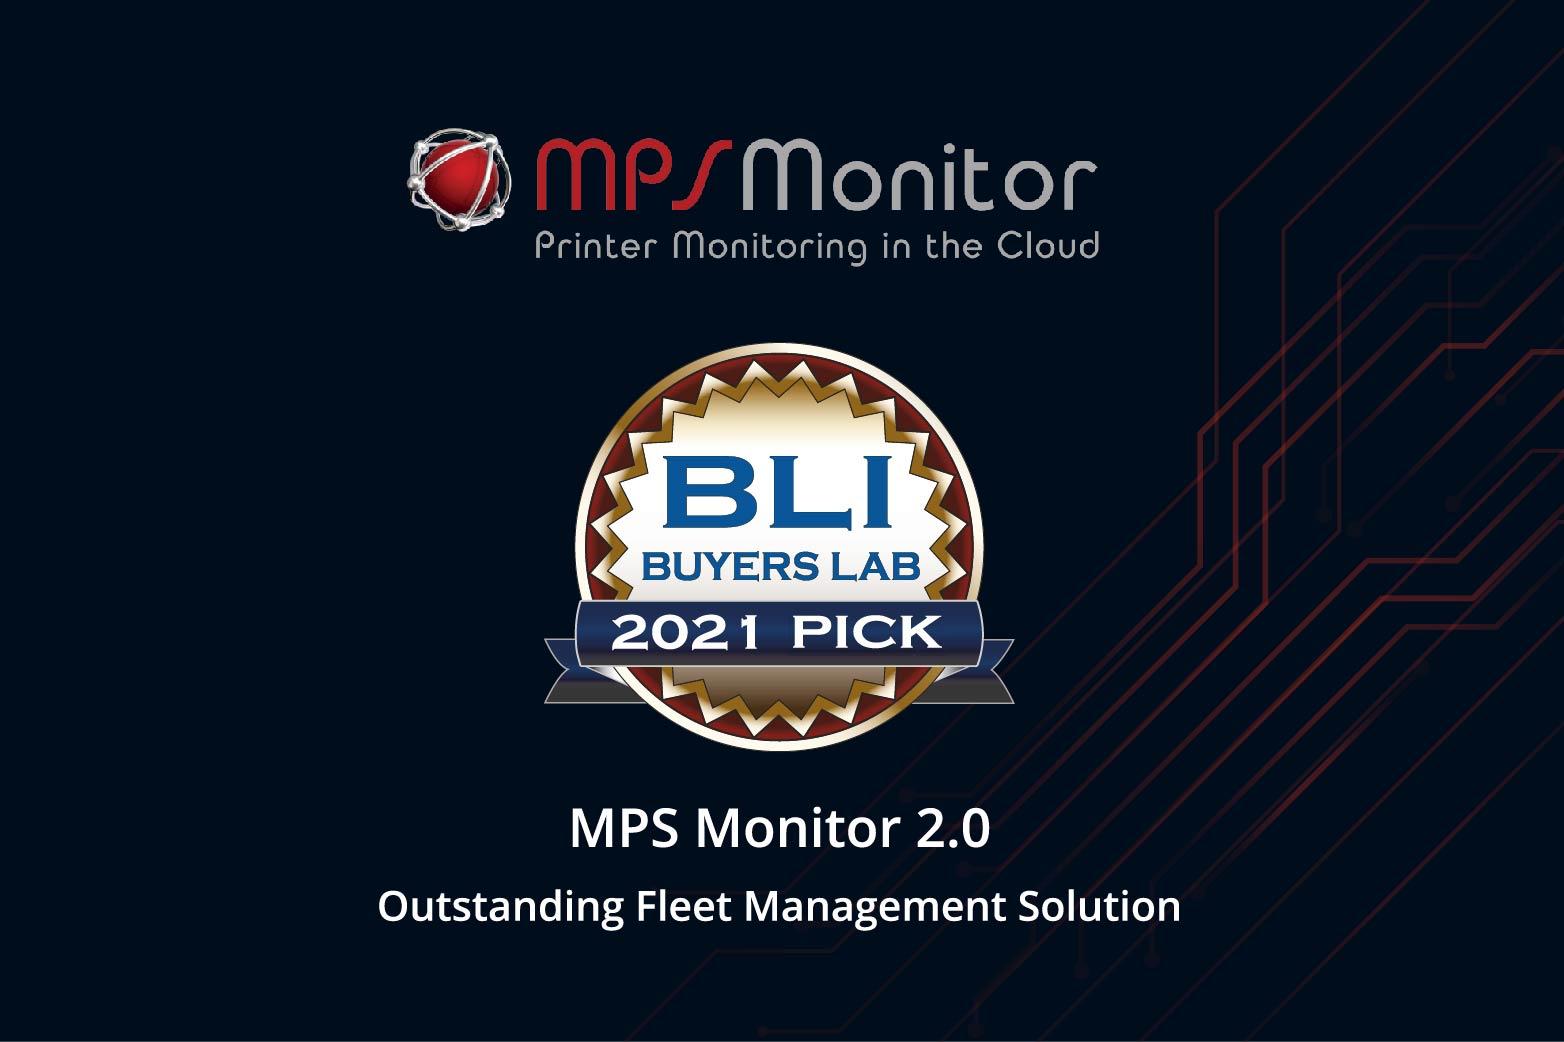 Mps Monitor BLI 2021